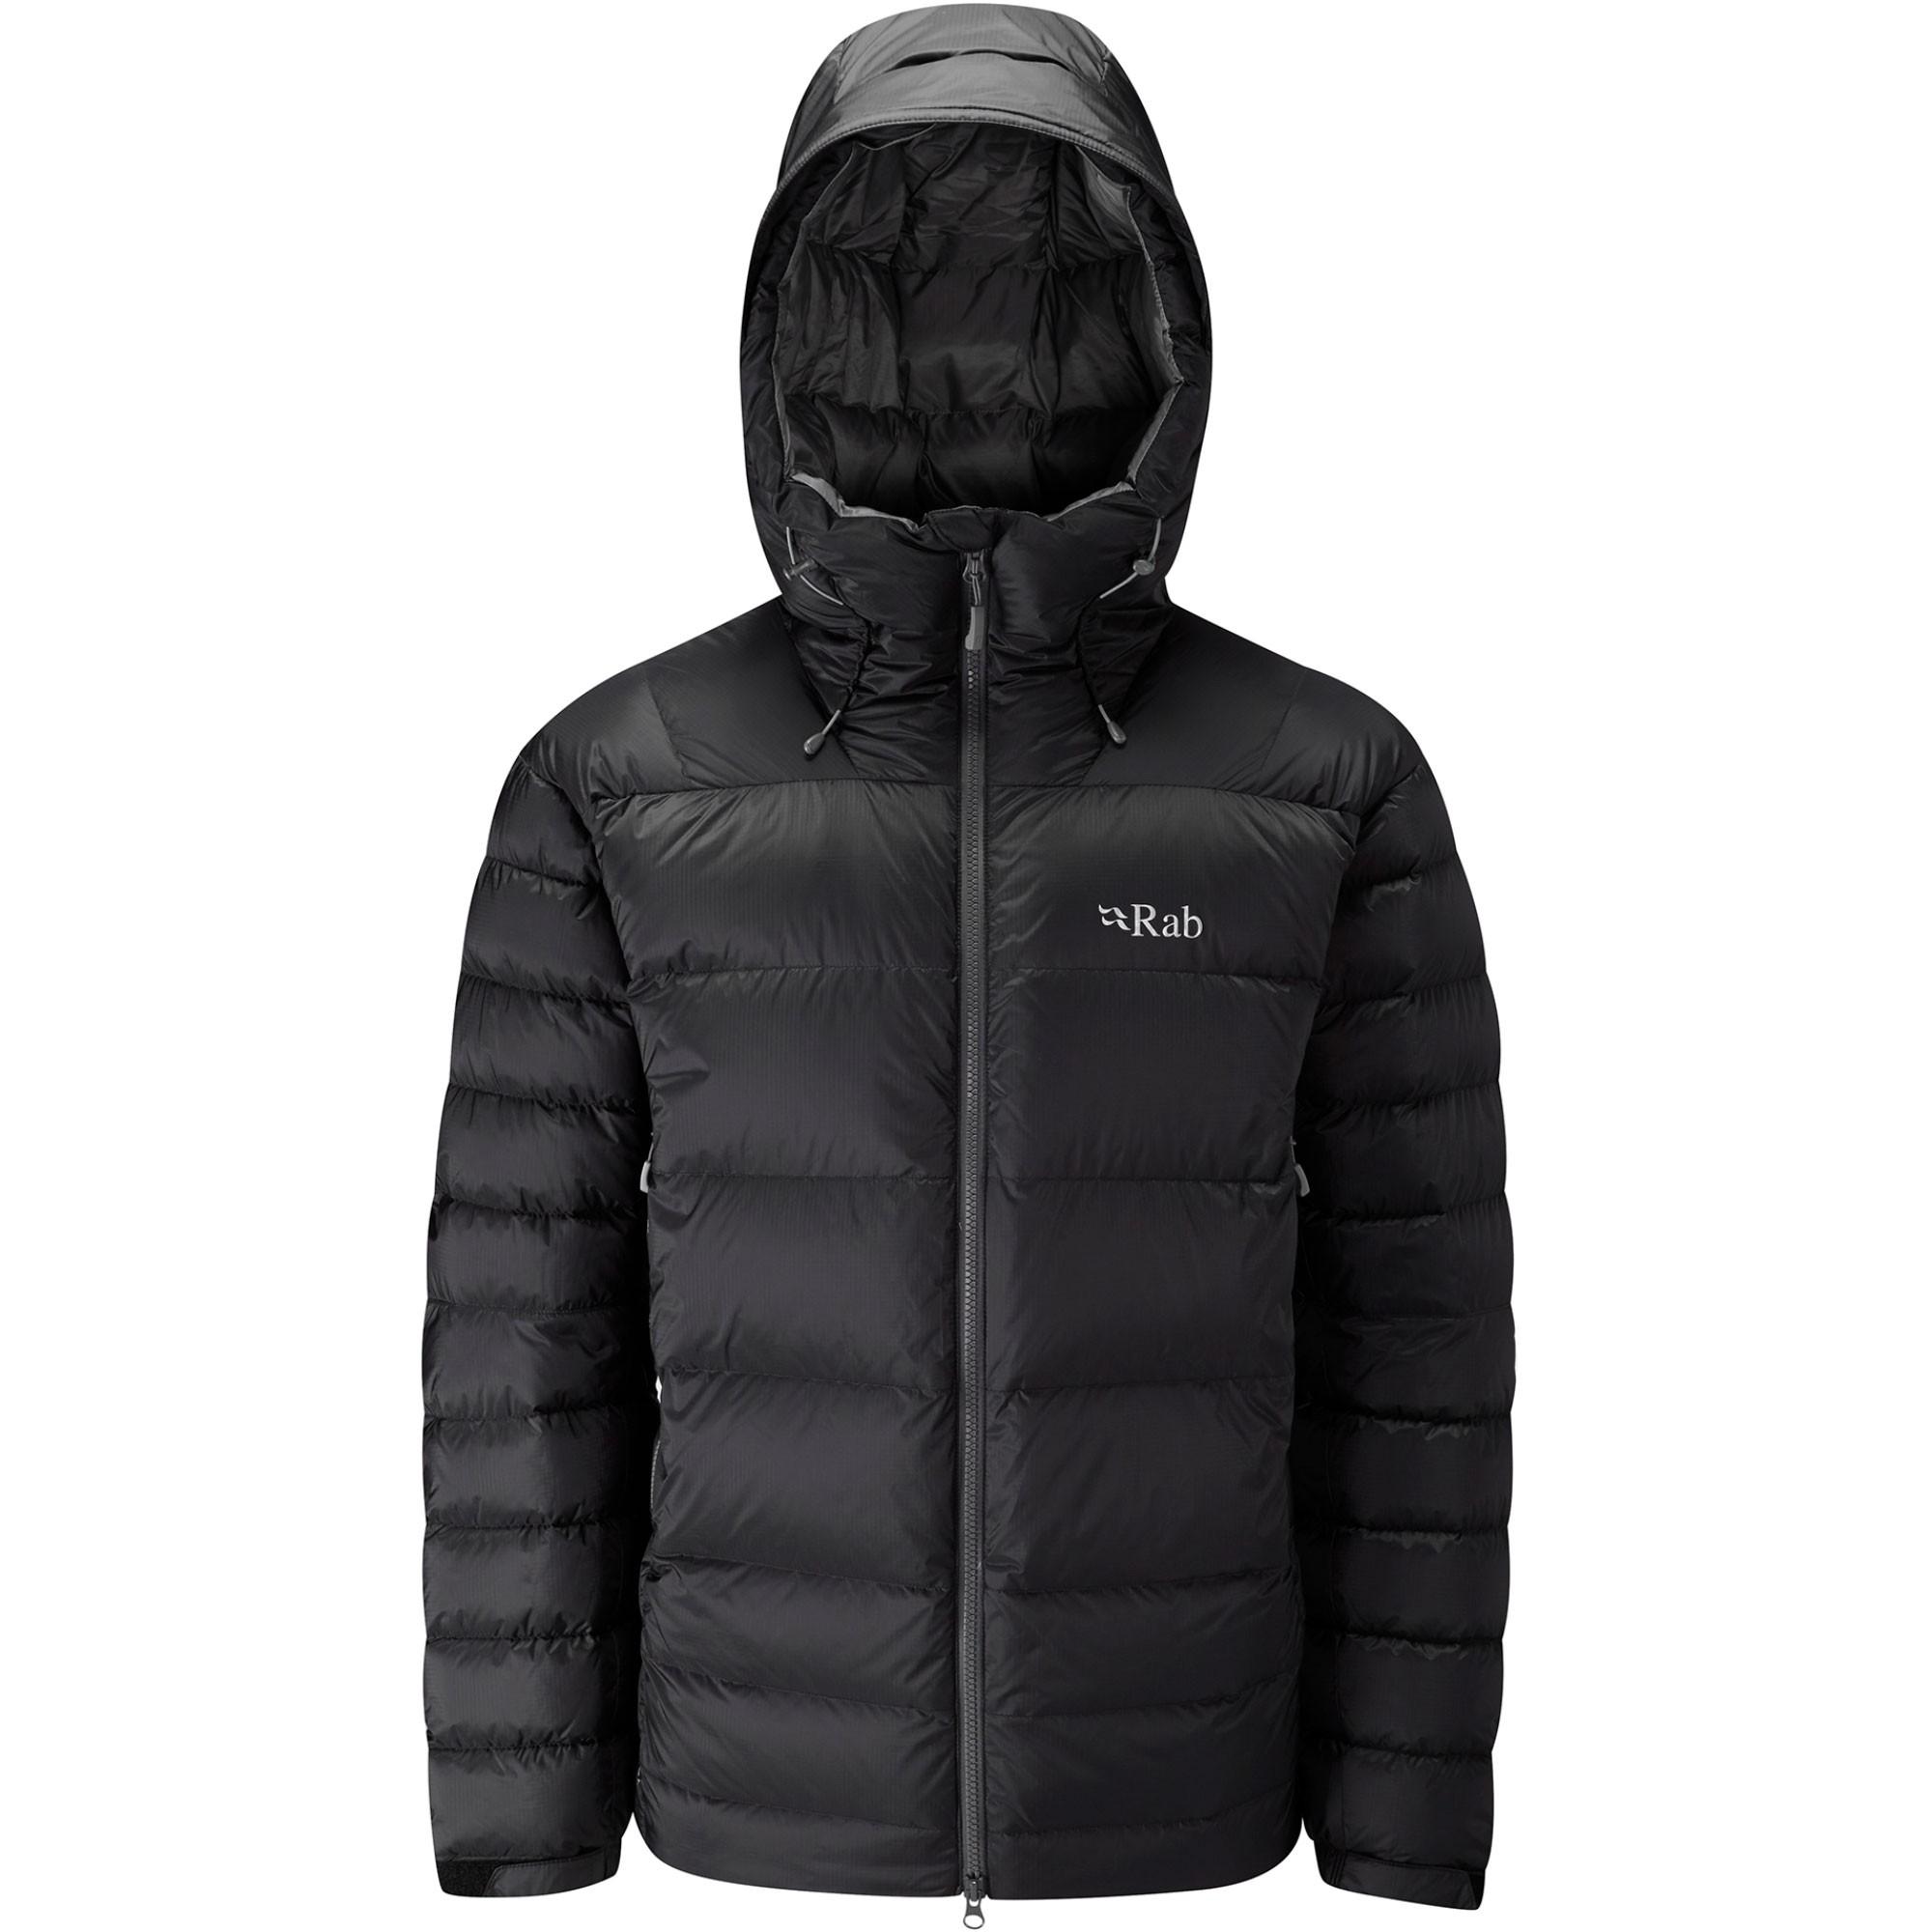 Rab-positron-jacket-black-QDN-49-BL-W17